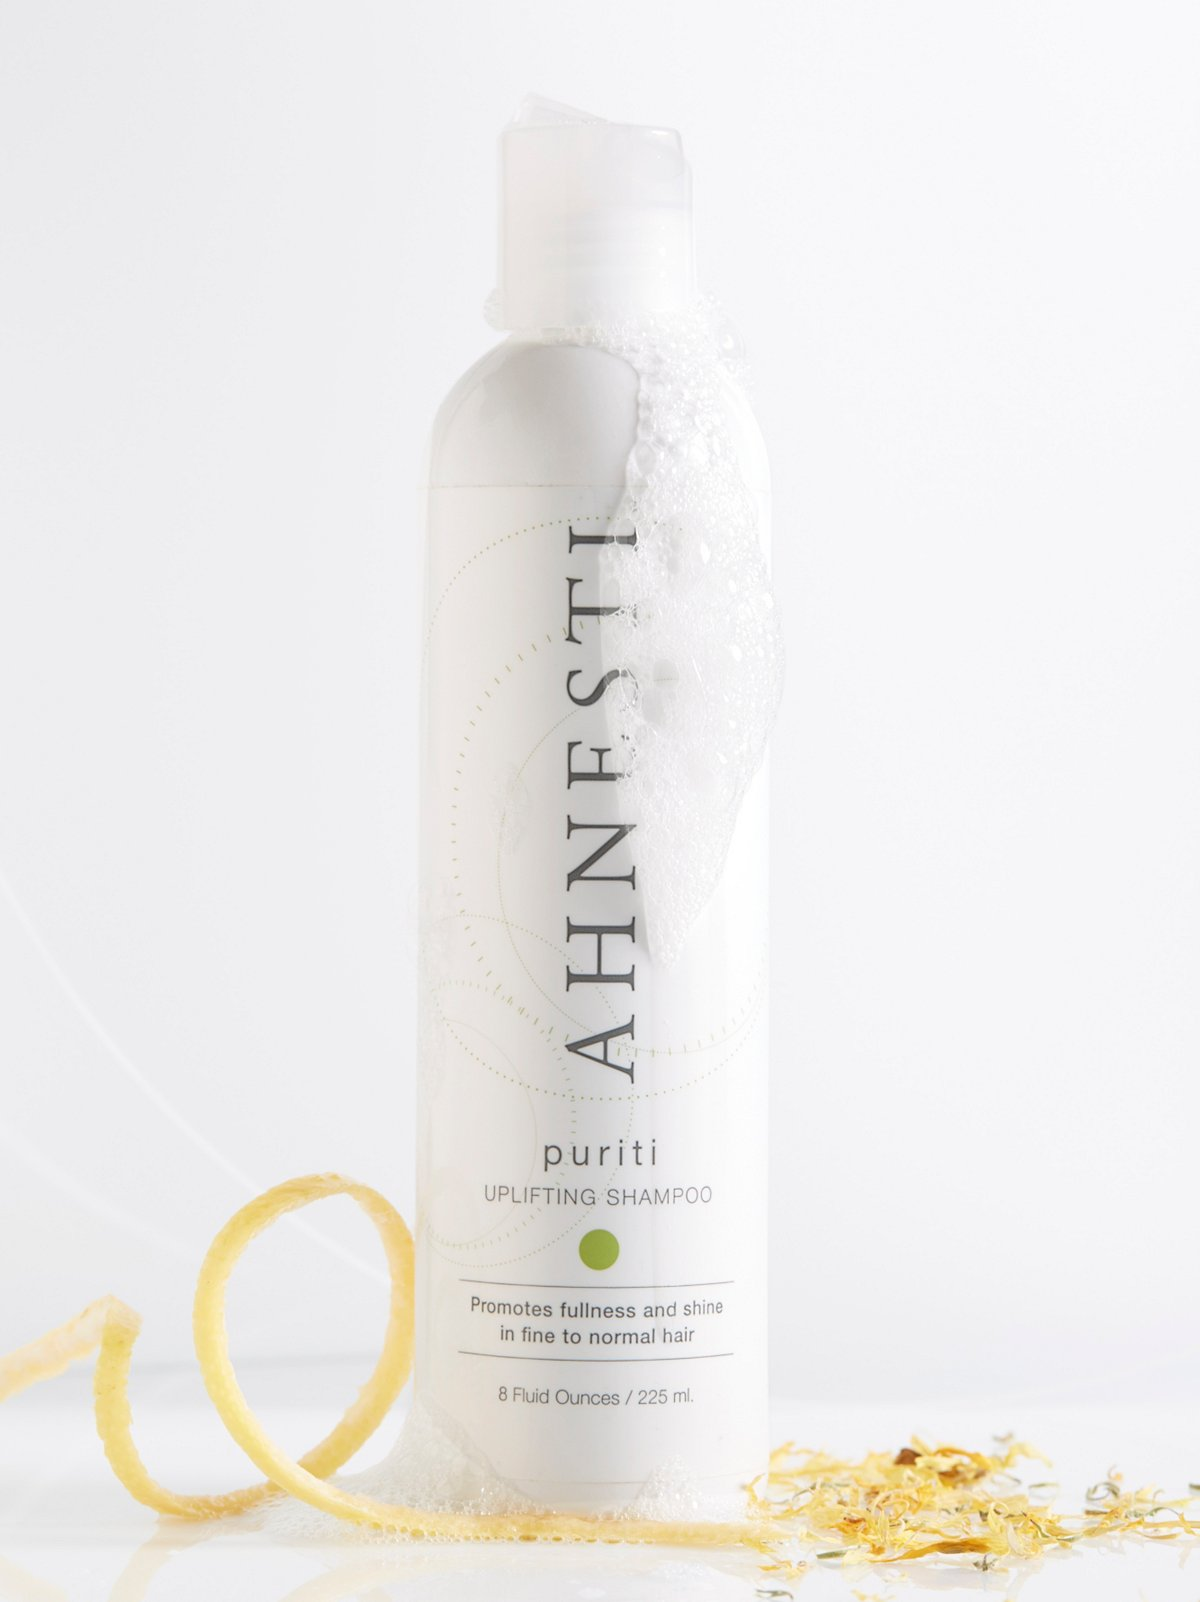 PURITI Uplifting Shampoo